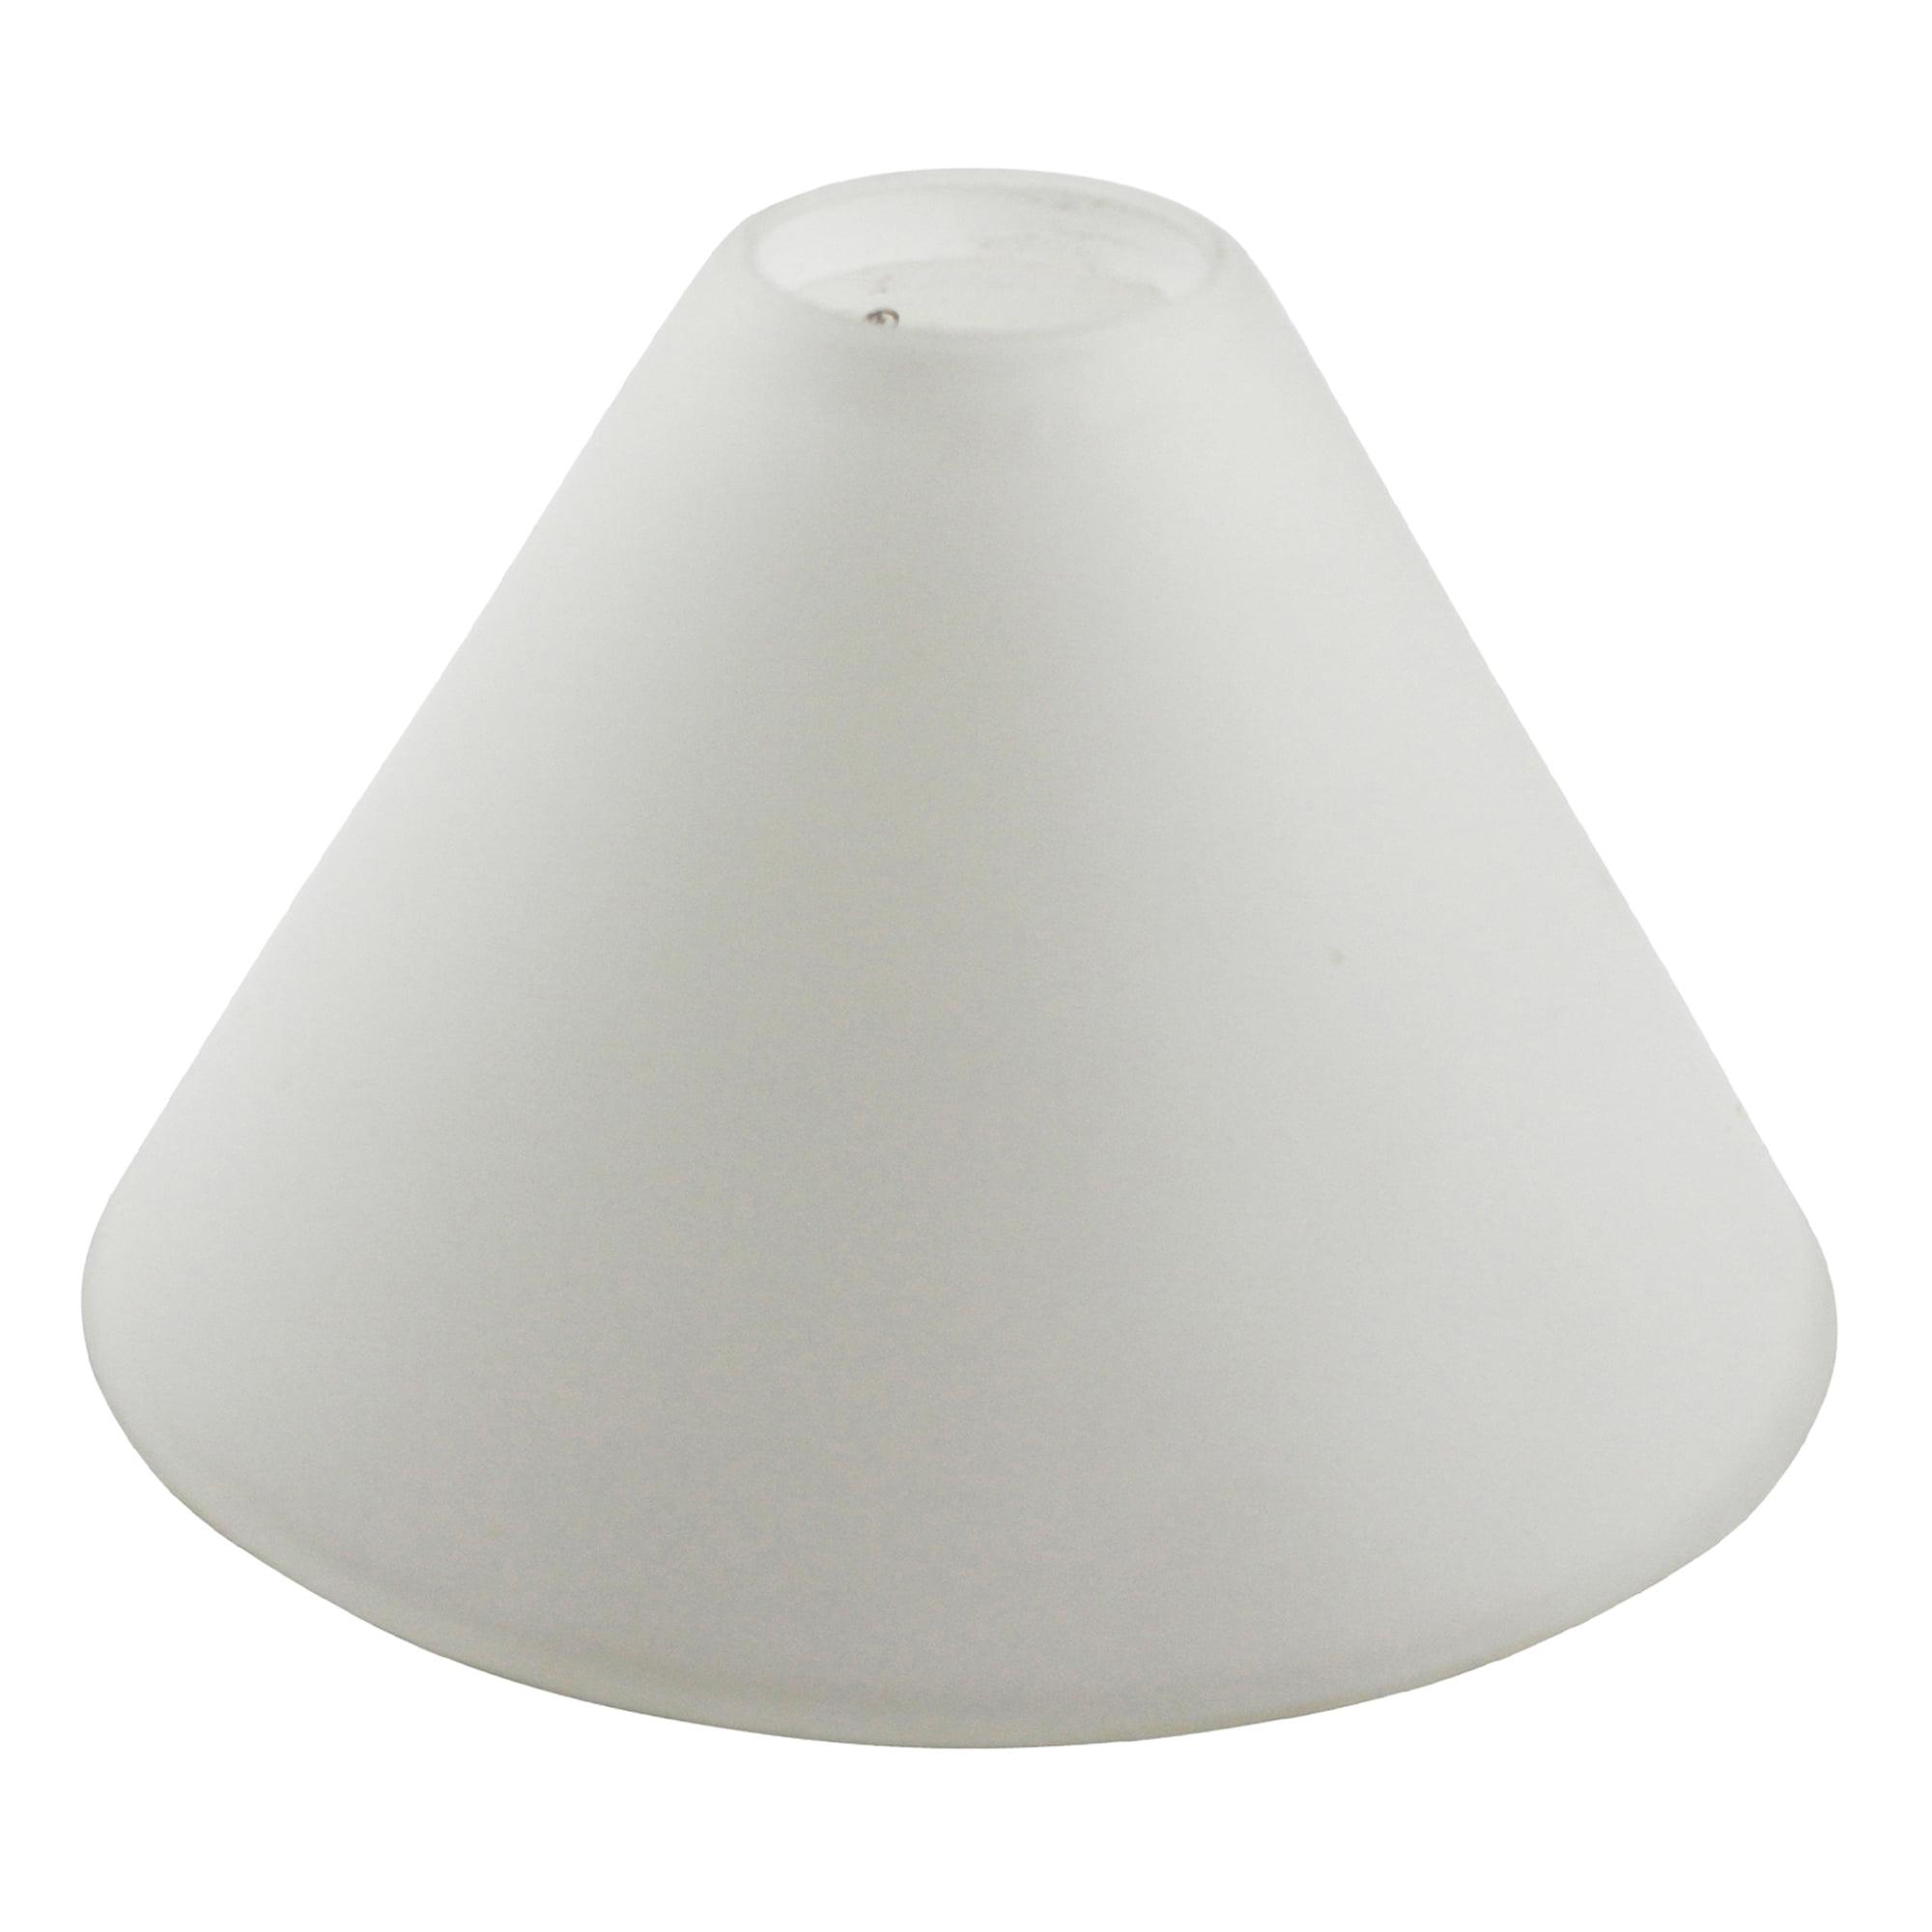 Juno TF160SL Cone Light Fixture New Free Shipping